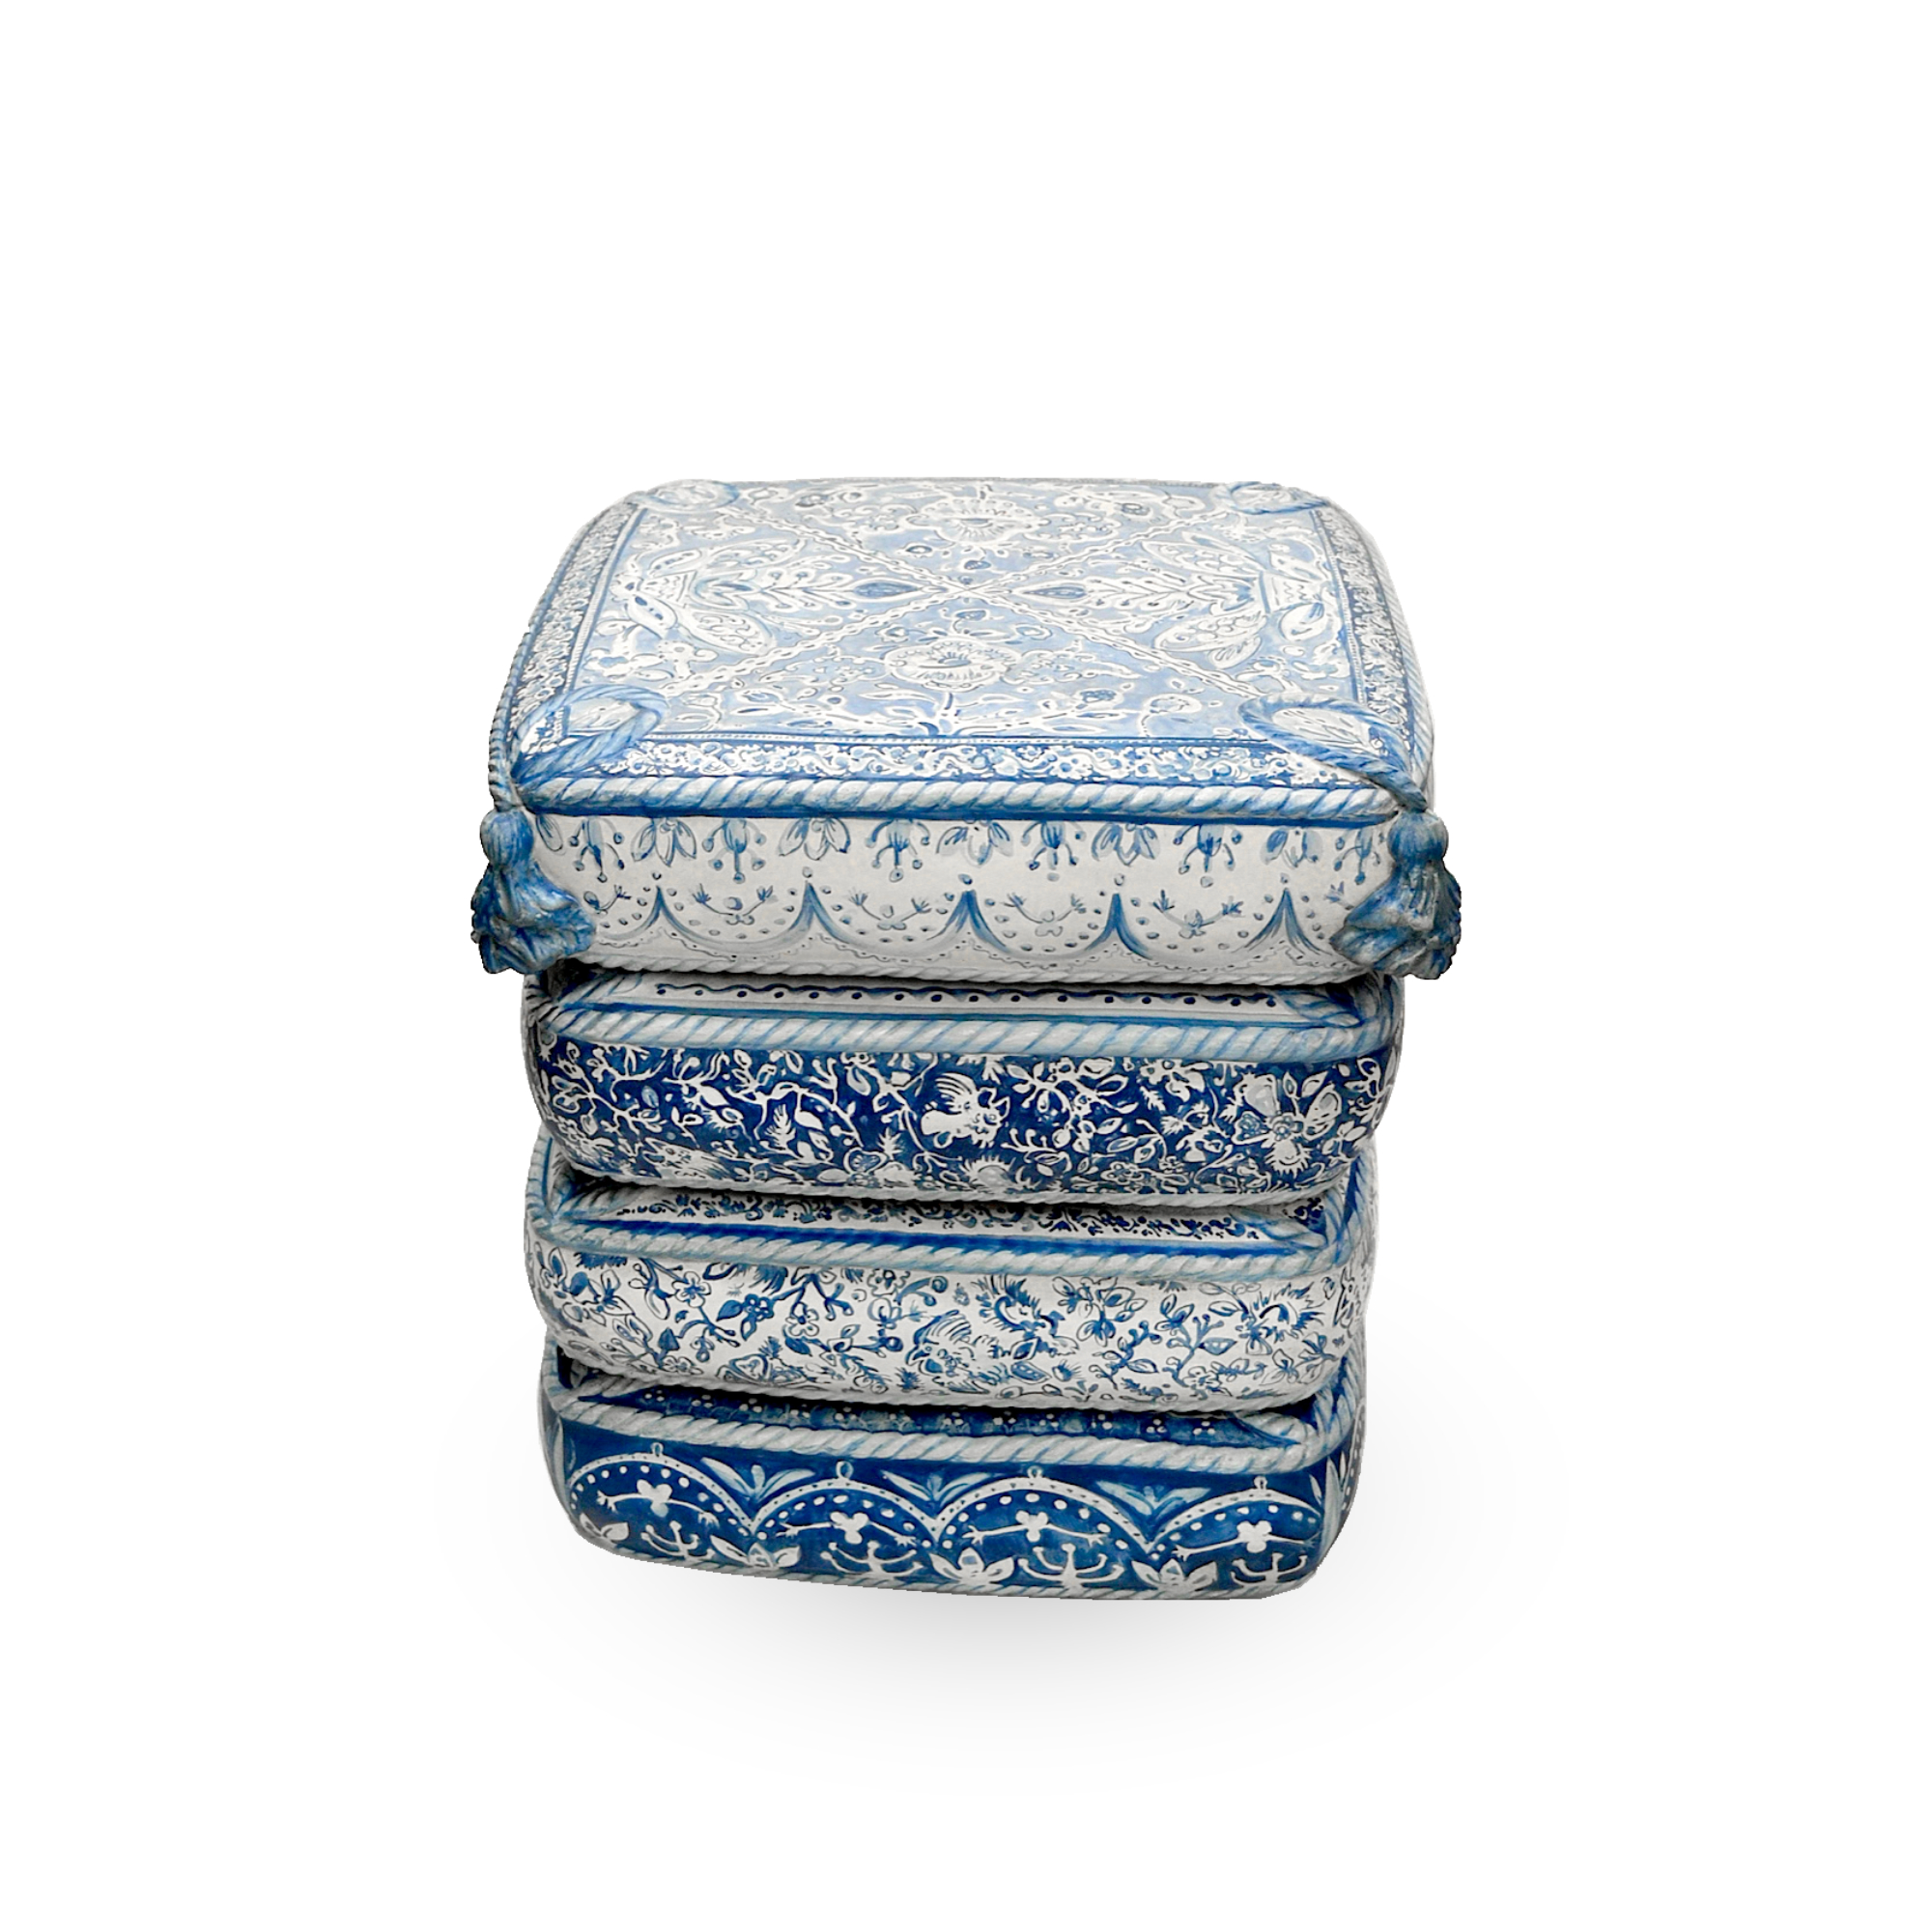 Hand-Painted-Cushion-Blue-Floral.jpg